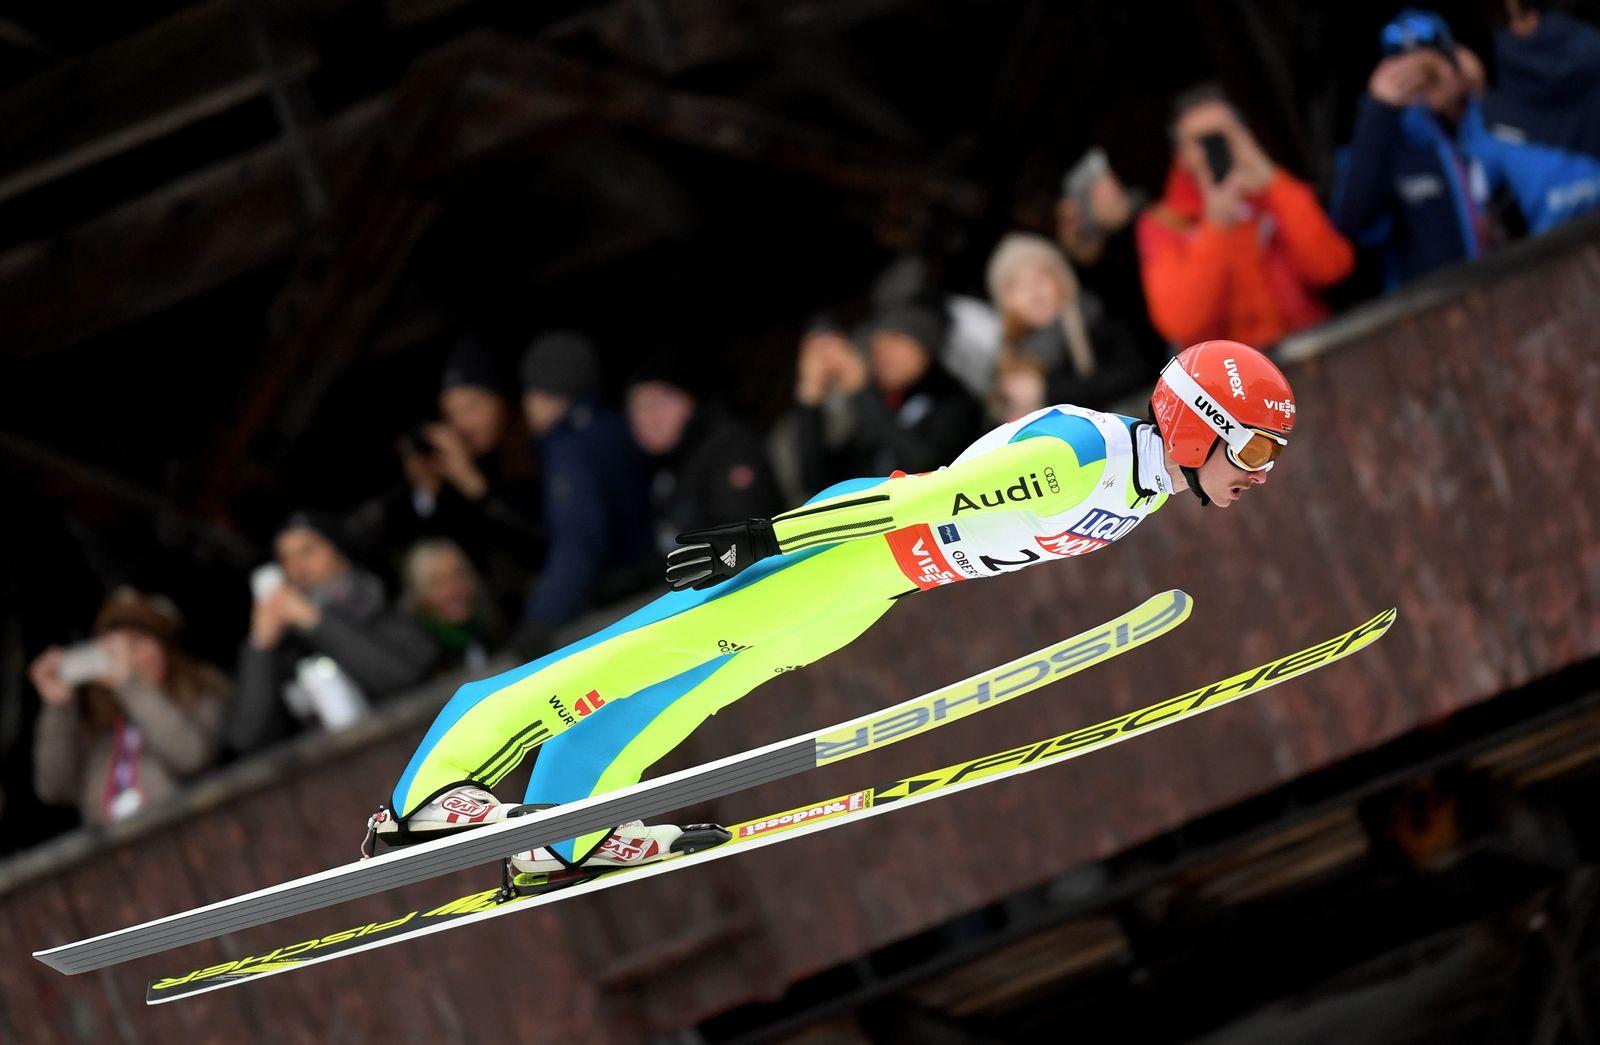 Richard Freitag Skiflug-WM